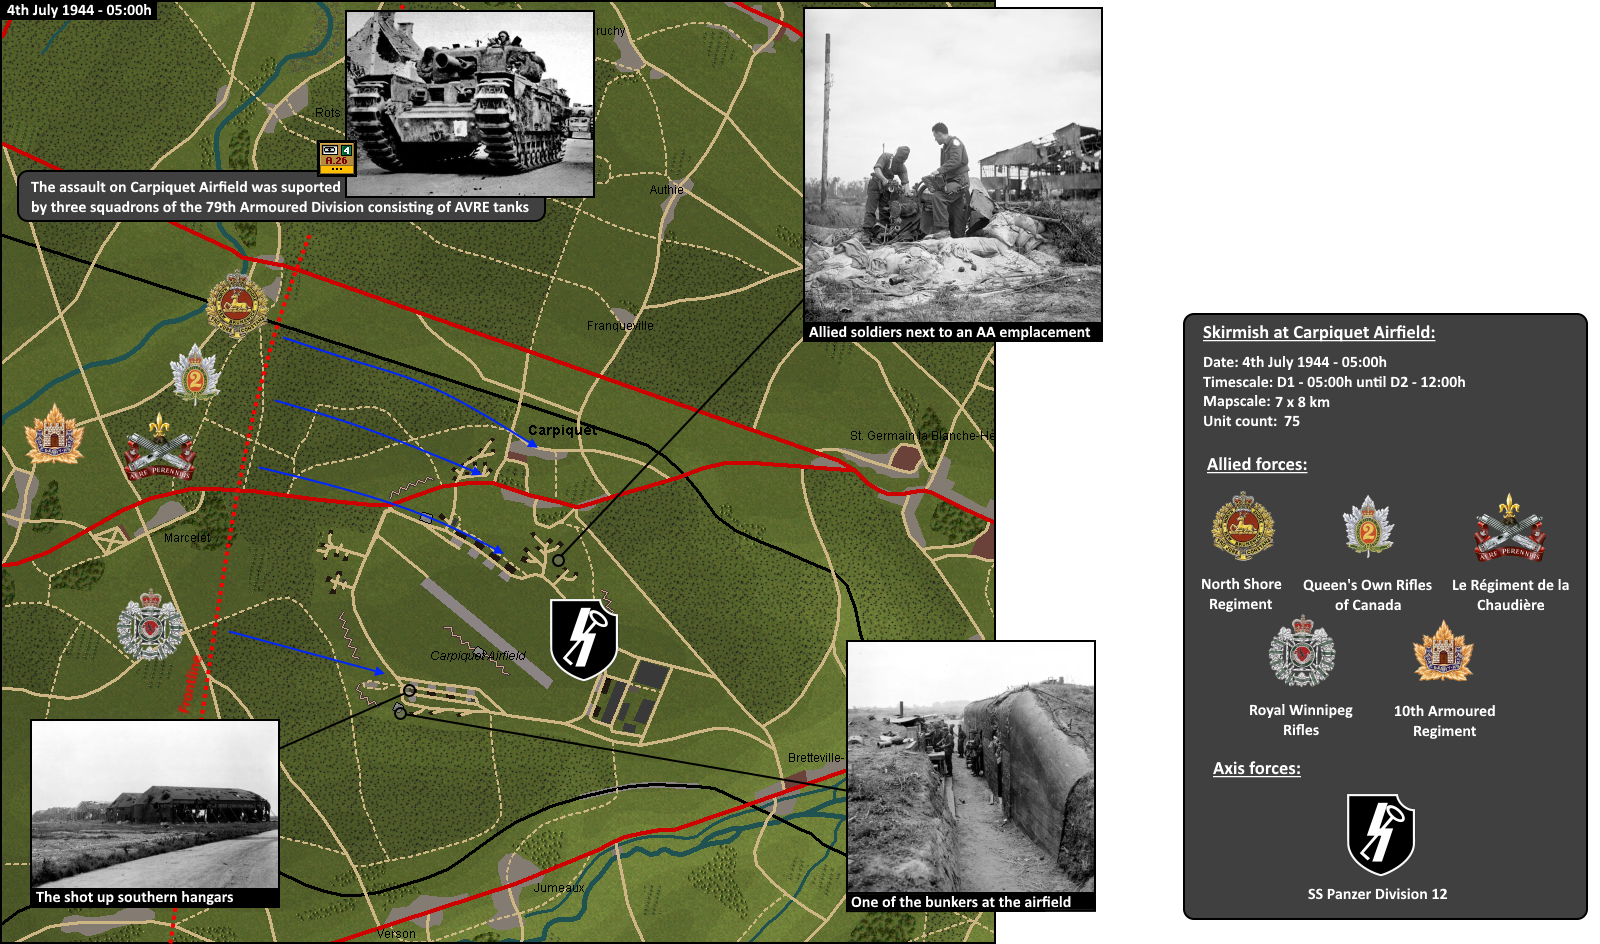 Carpiquet Airfield map.png